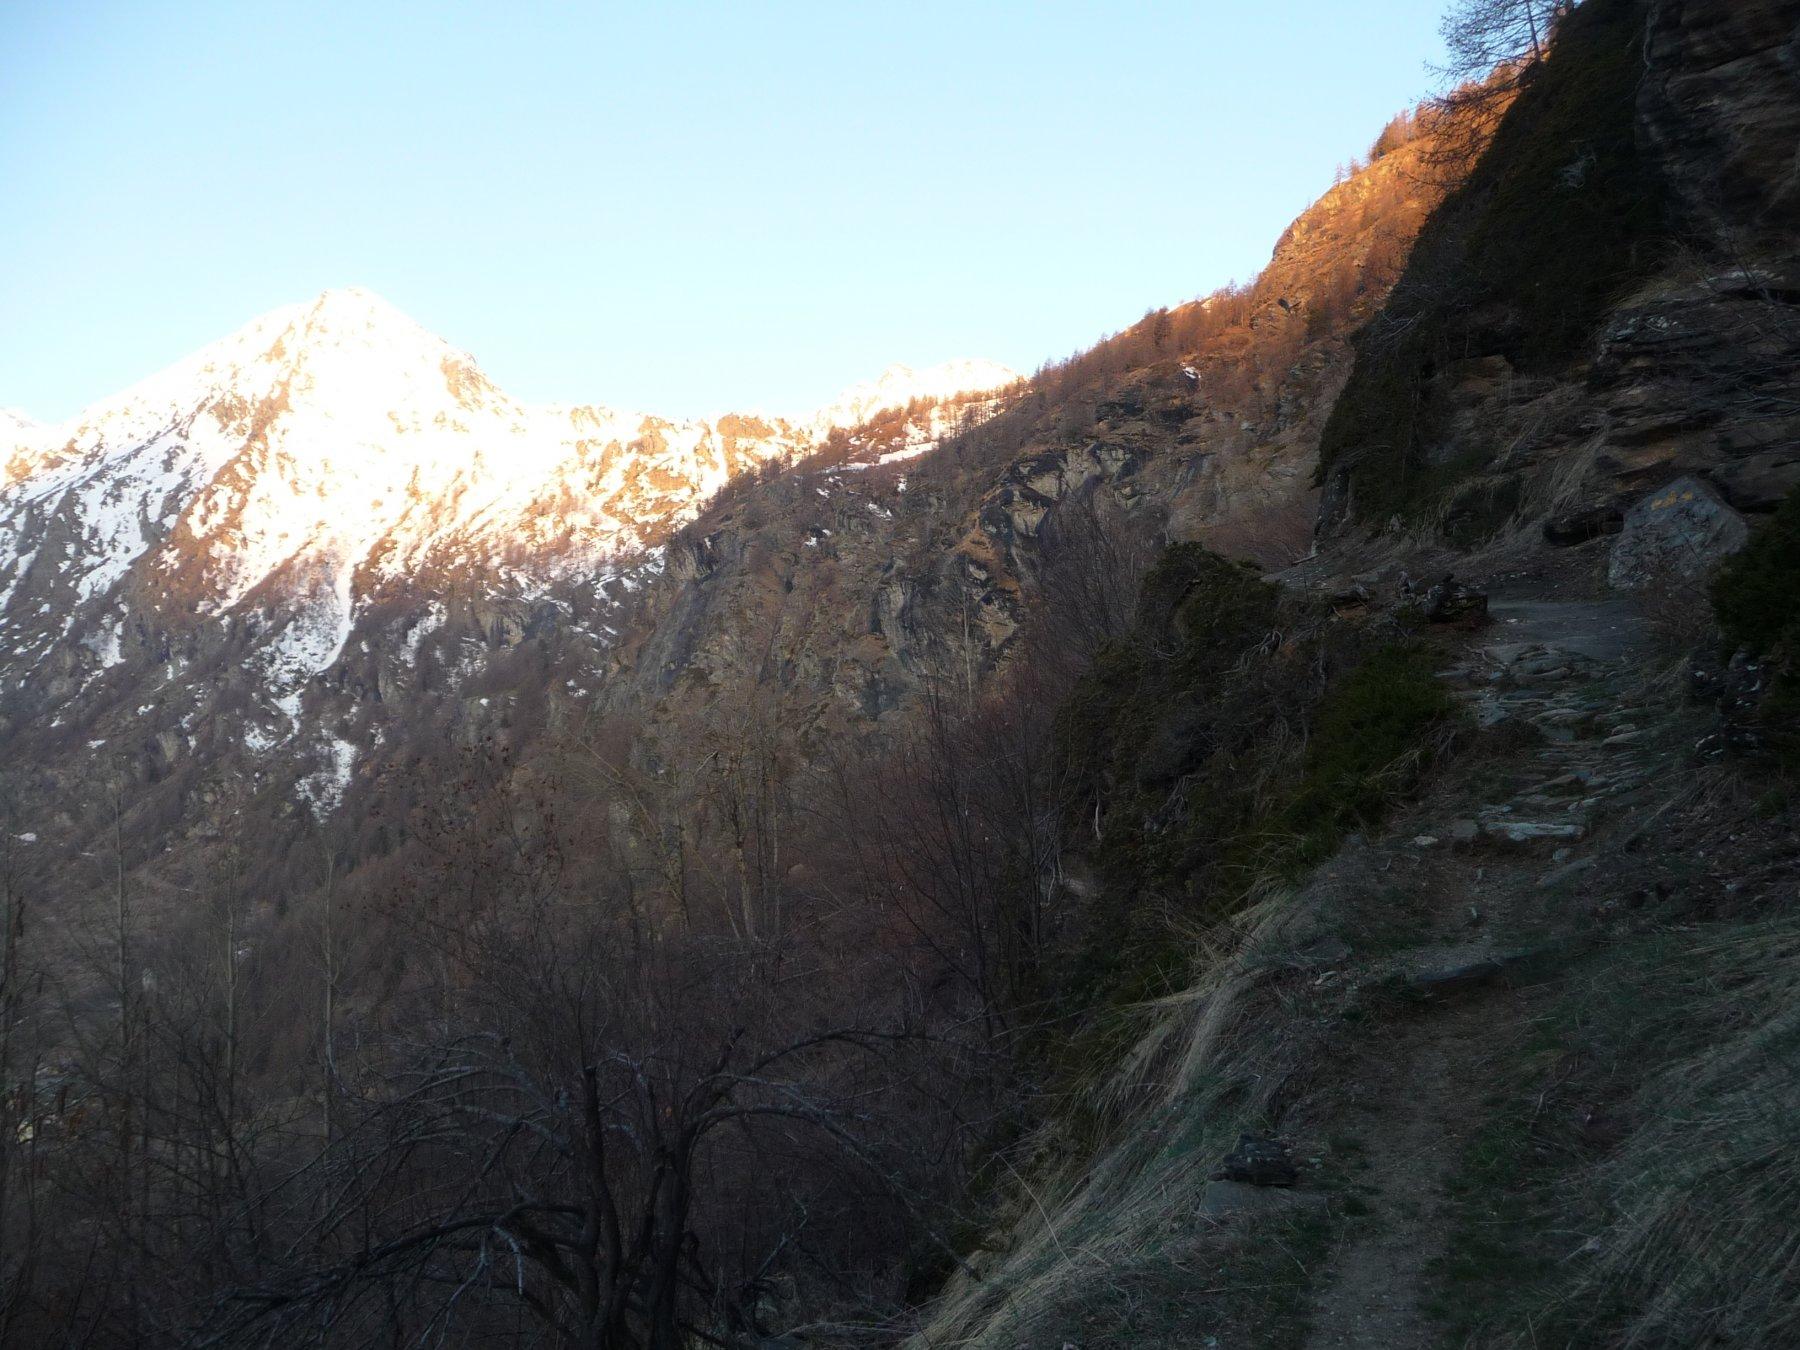 Sentiero all'alba